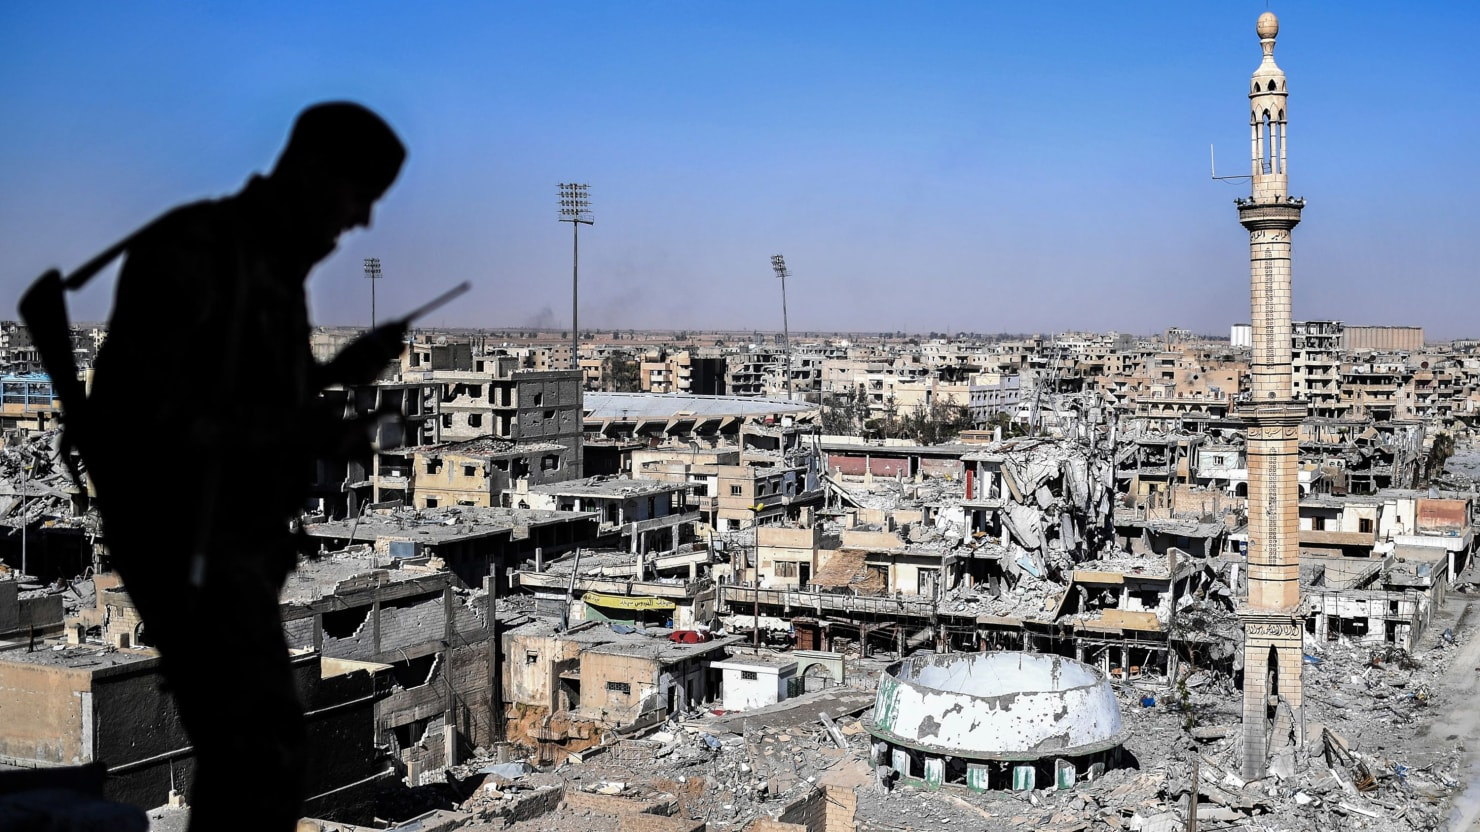 Abu Bakr al-Baghdadi Is Dead. The War on Terror Will Create Another.